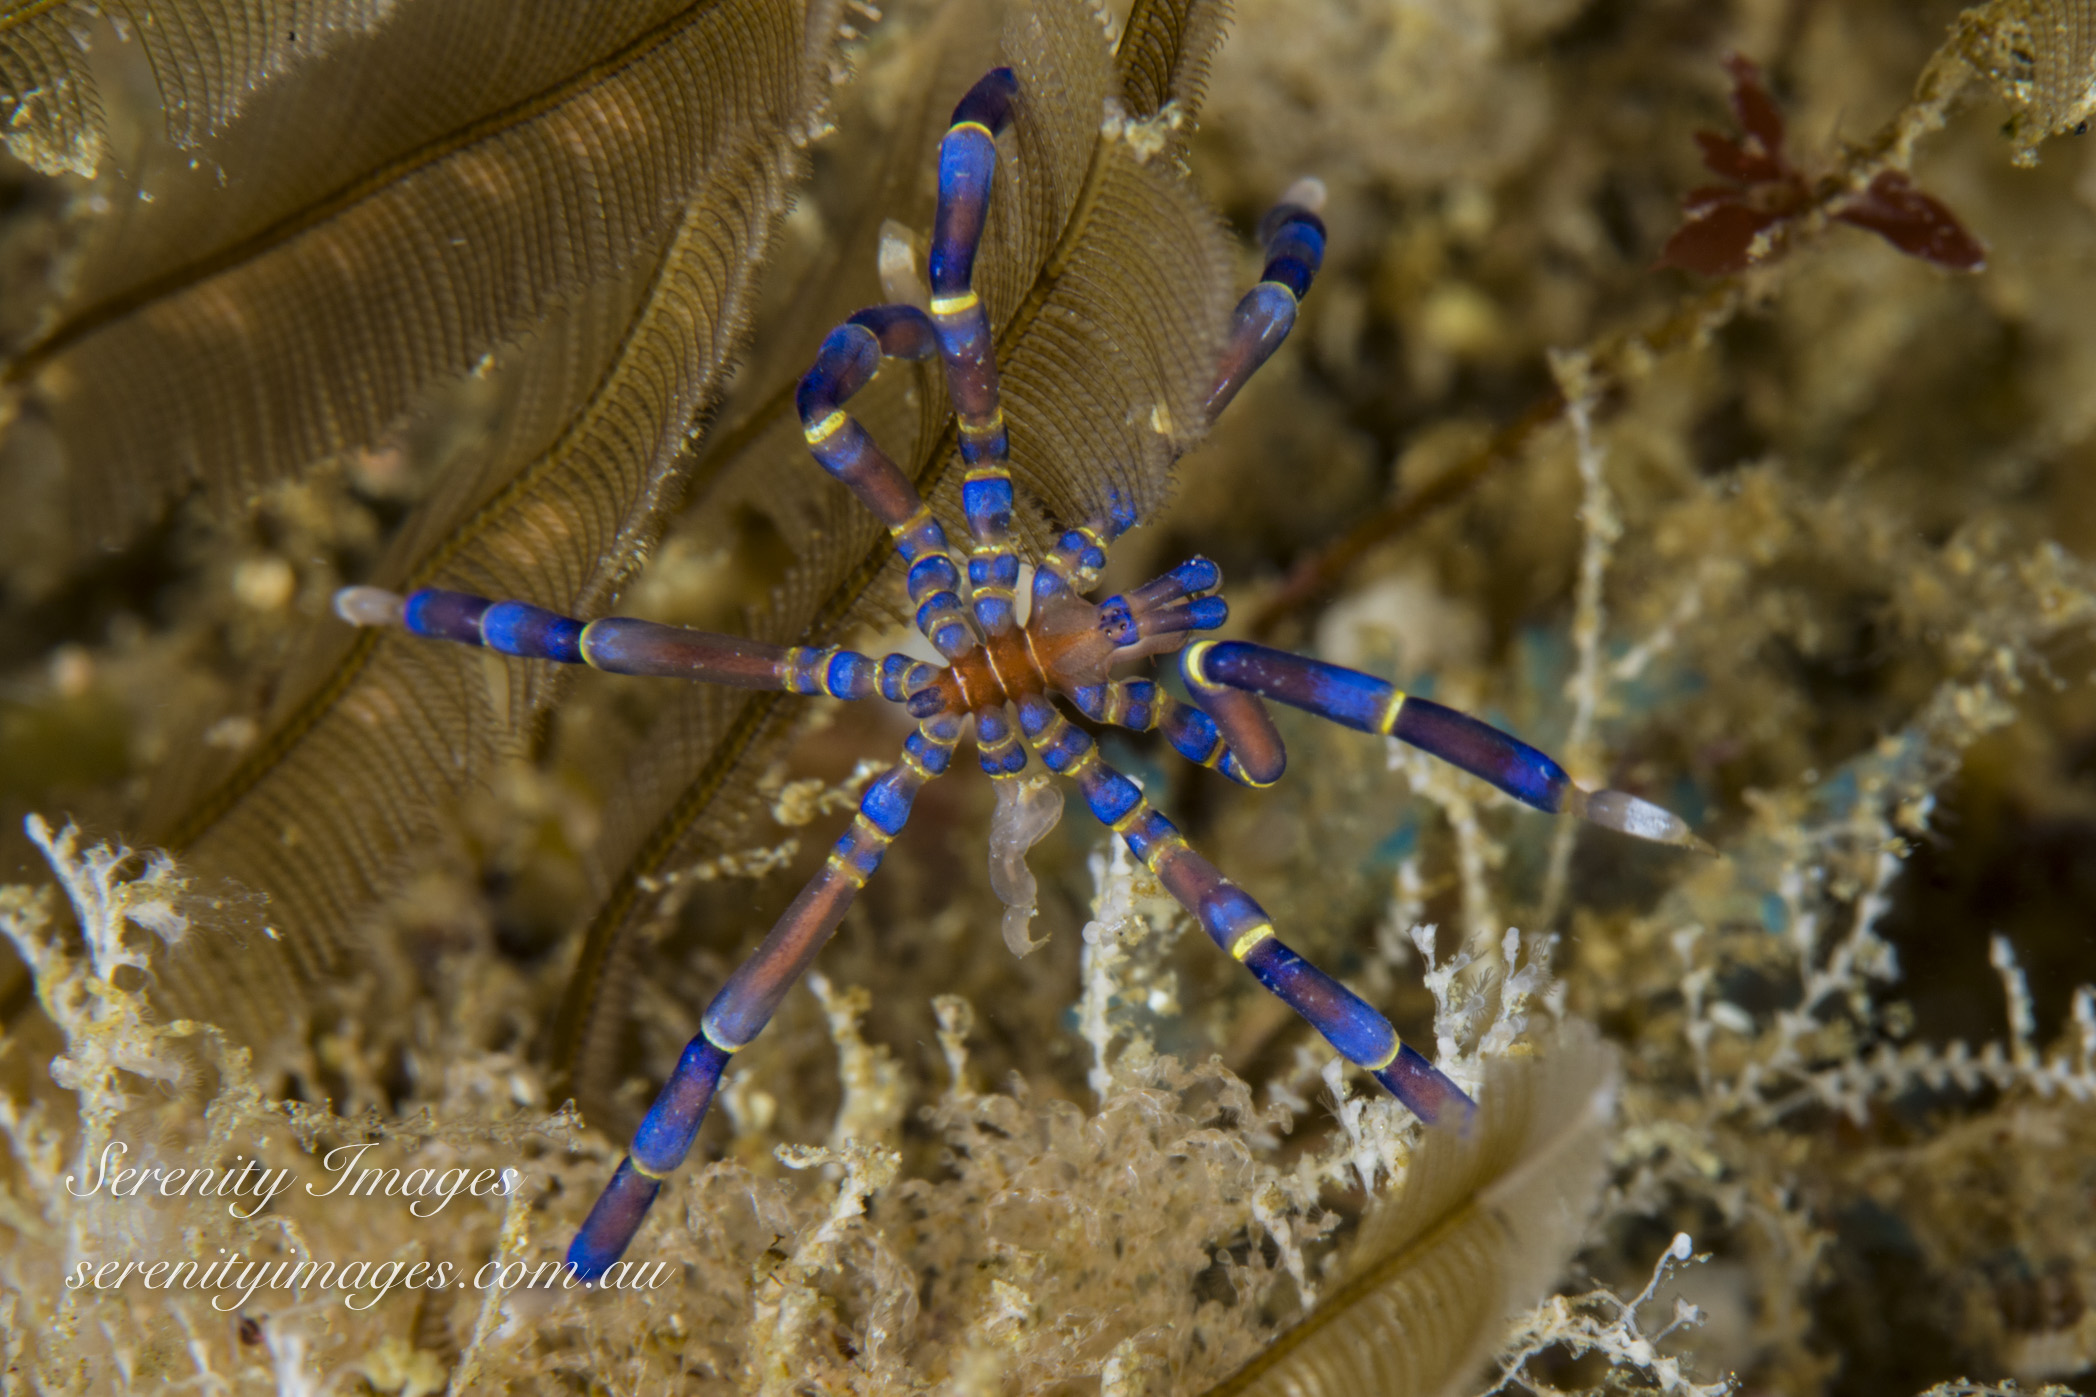 Blue Knee Spider SI-7682